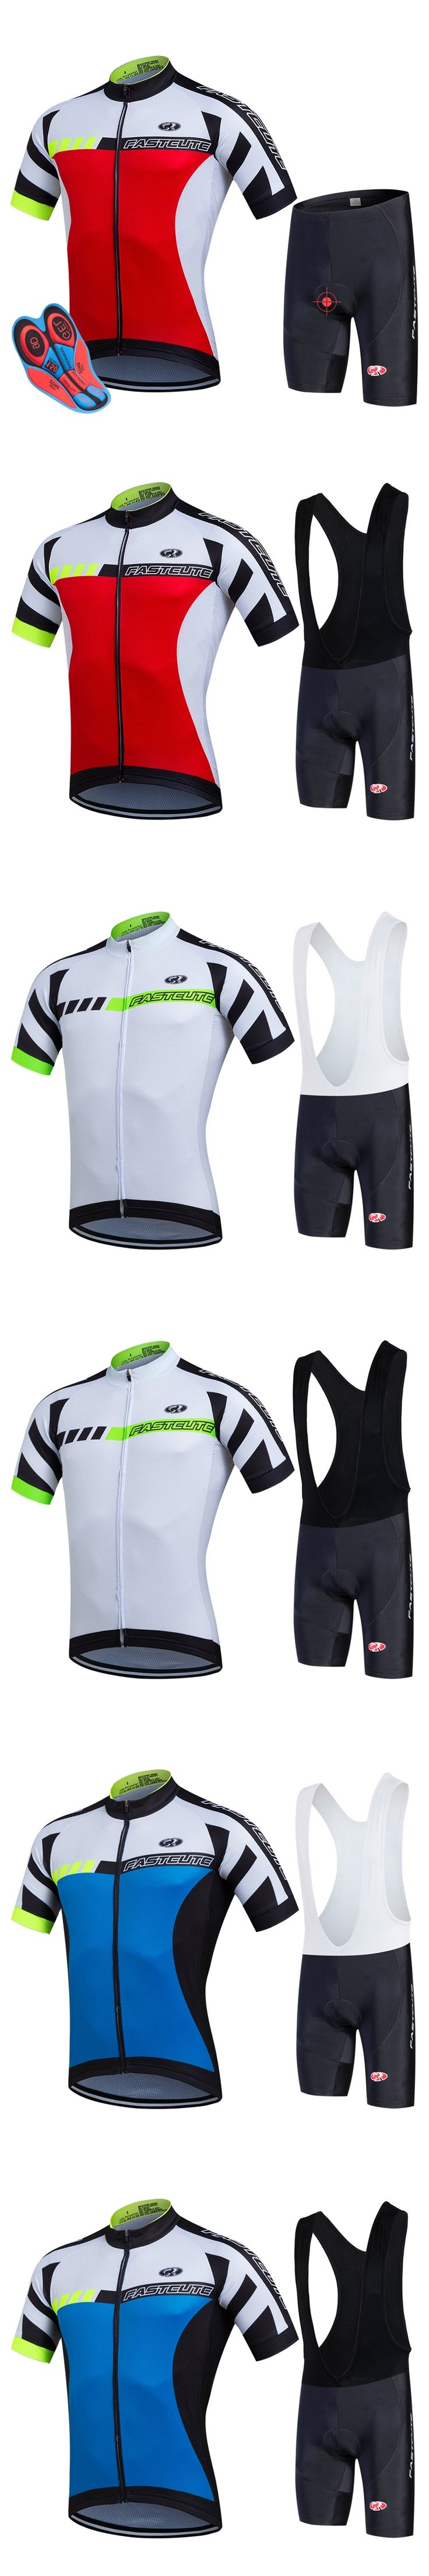 2017 Bicycle Cycling Jersey Set Short Sleeve Jerseys and Cycling bib Shorts Sets Mountain Bike Clothing Maillot Ropa Ciclismo